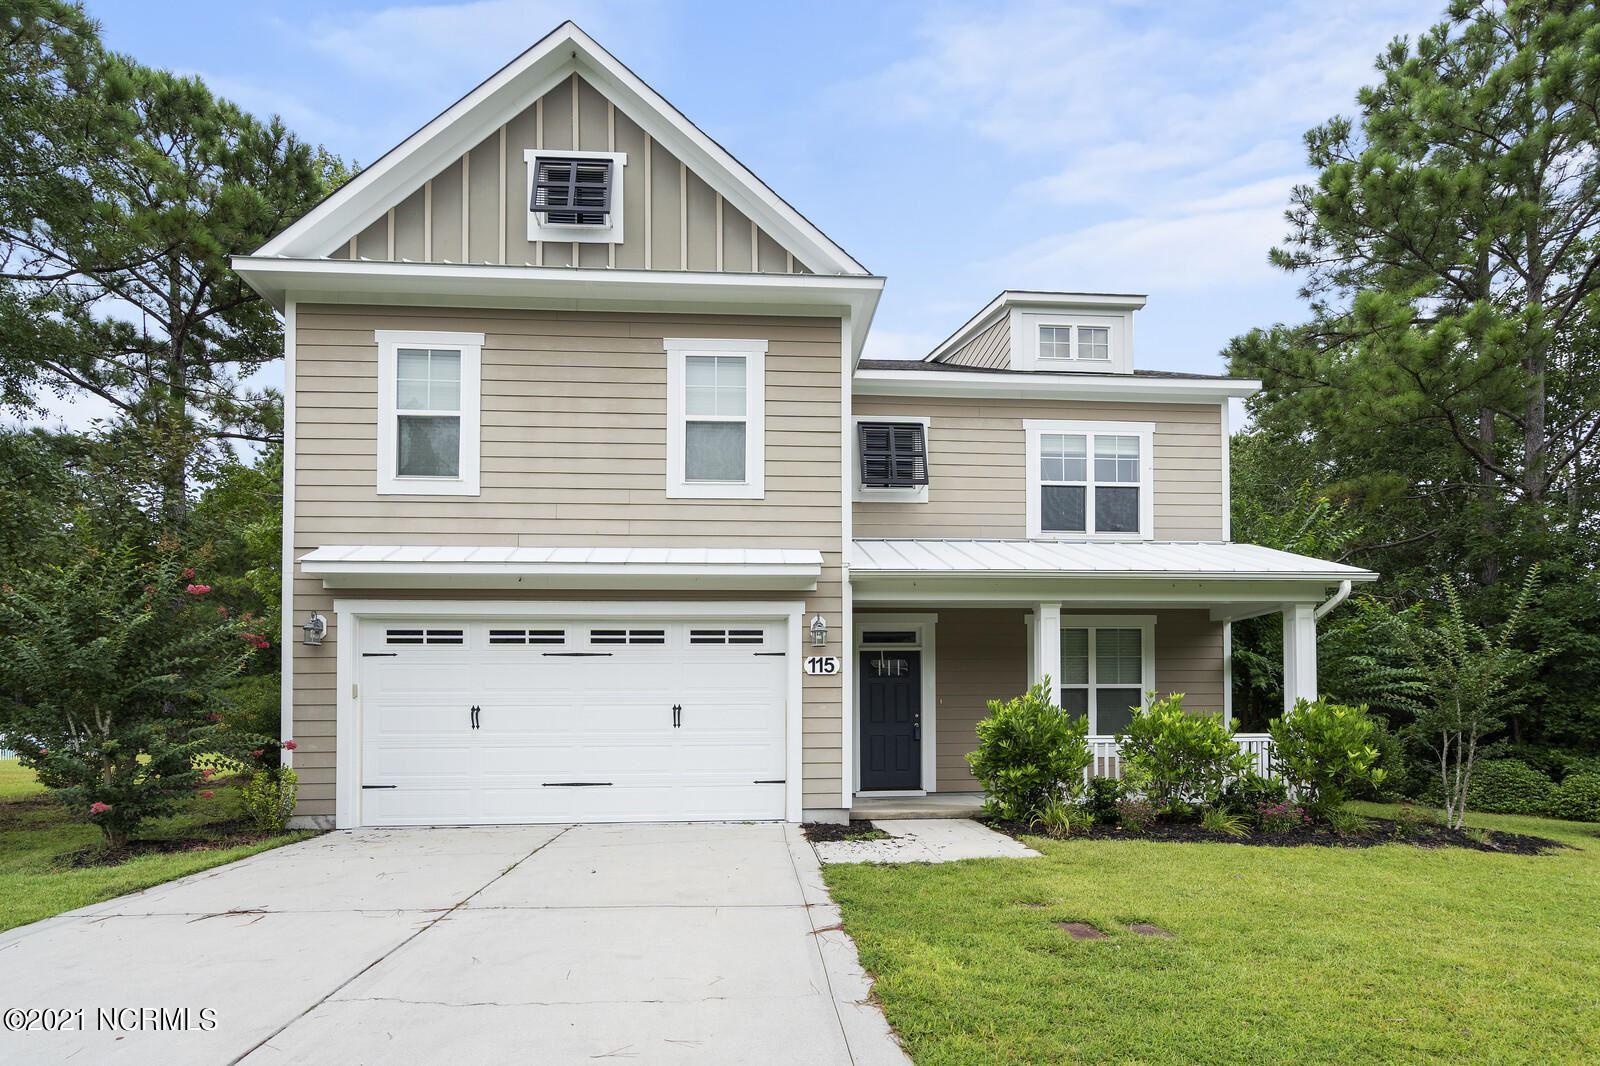 Photo for 115 Saltwater Landing Drive, Hampstead, NC 28443 (MLS # 100285457)